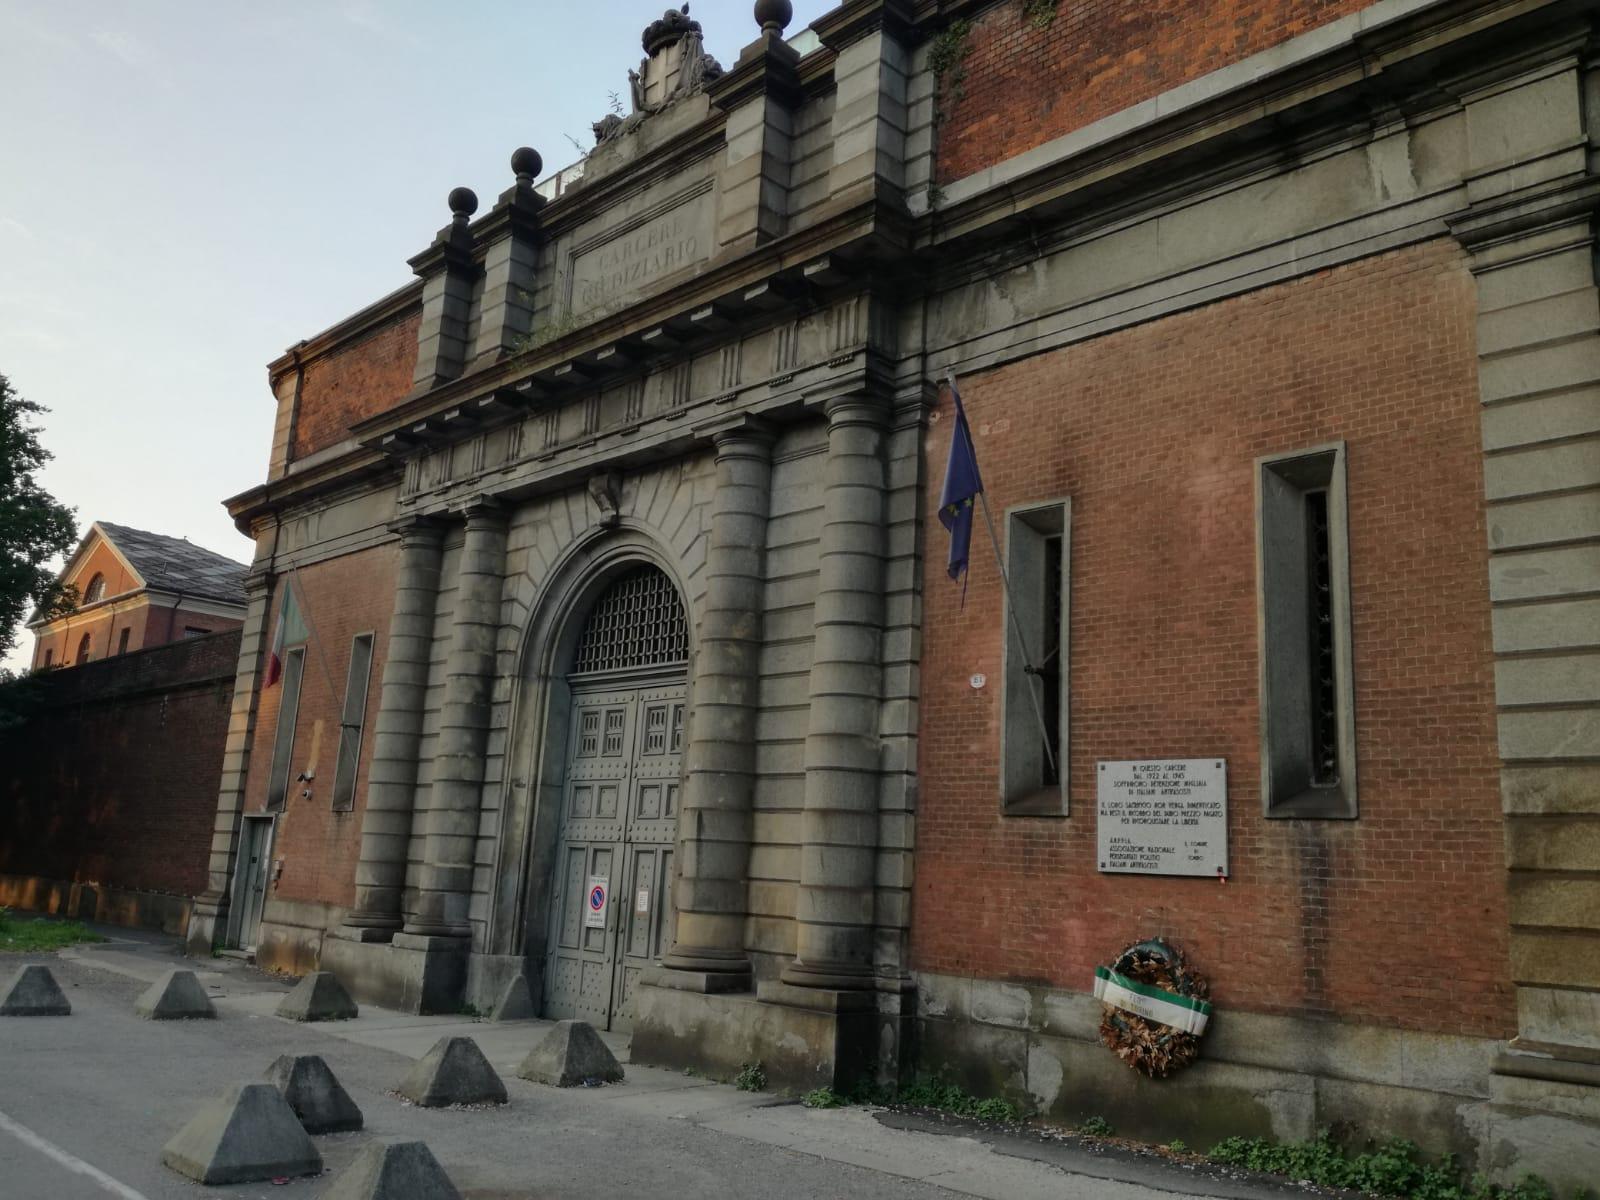 Calendario Aste Torino.Giudice Di Pace Di Torino